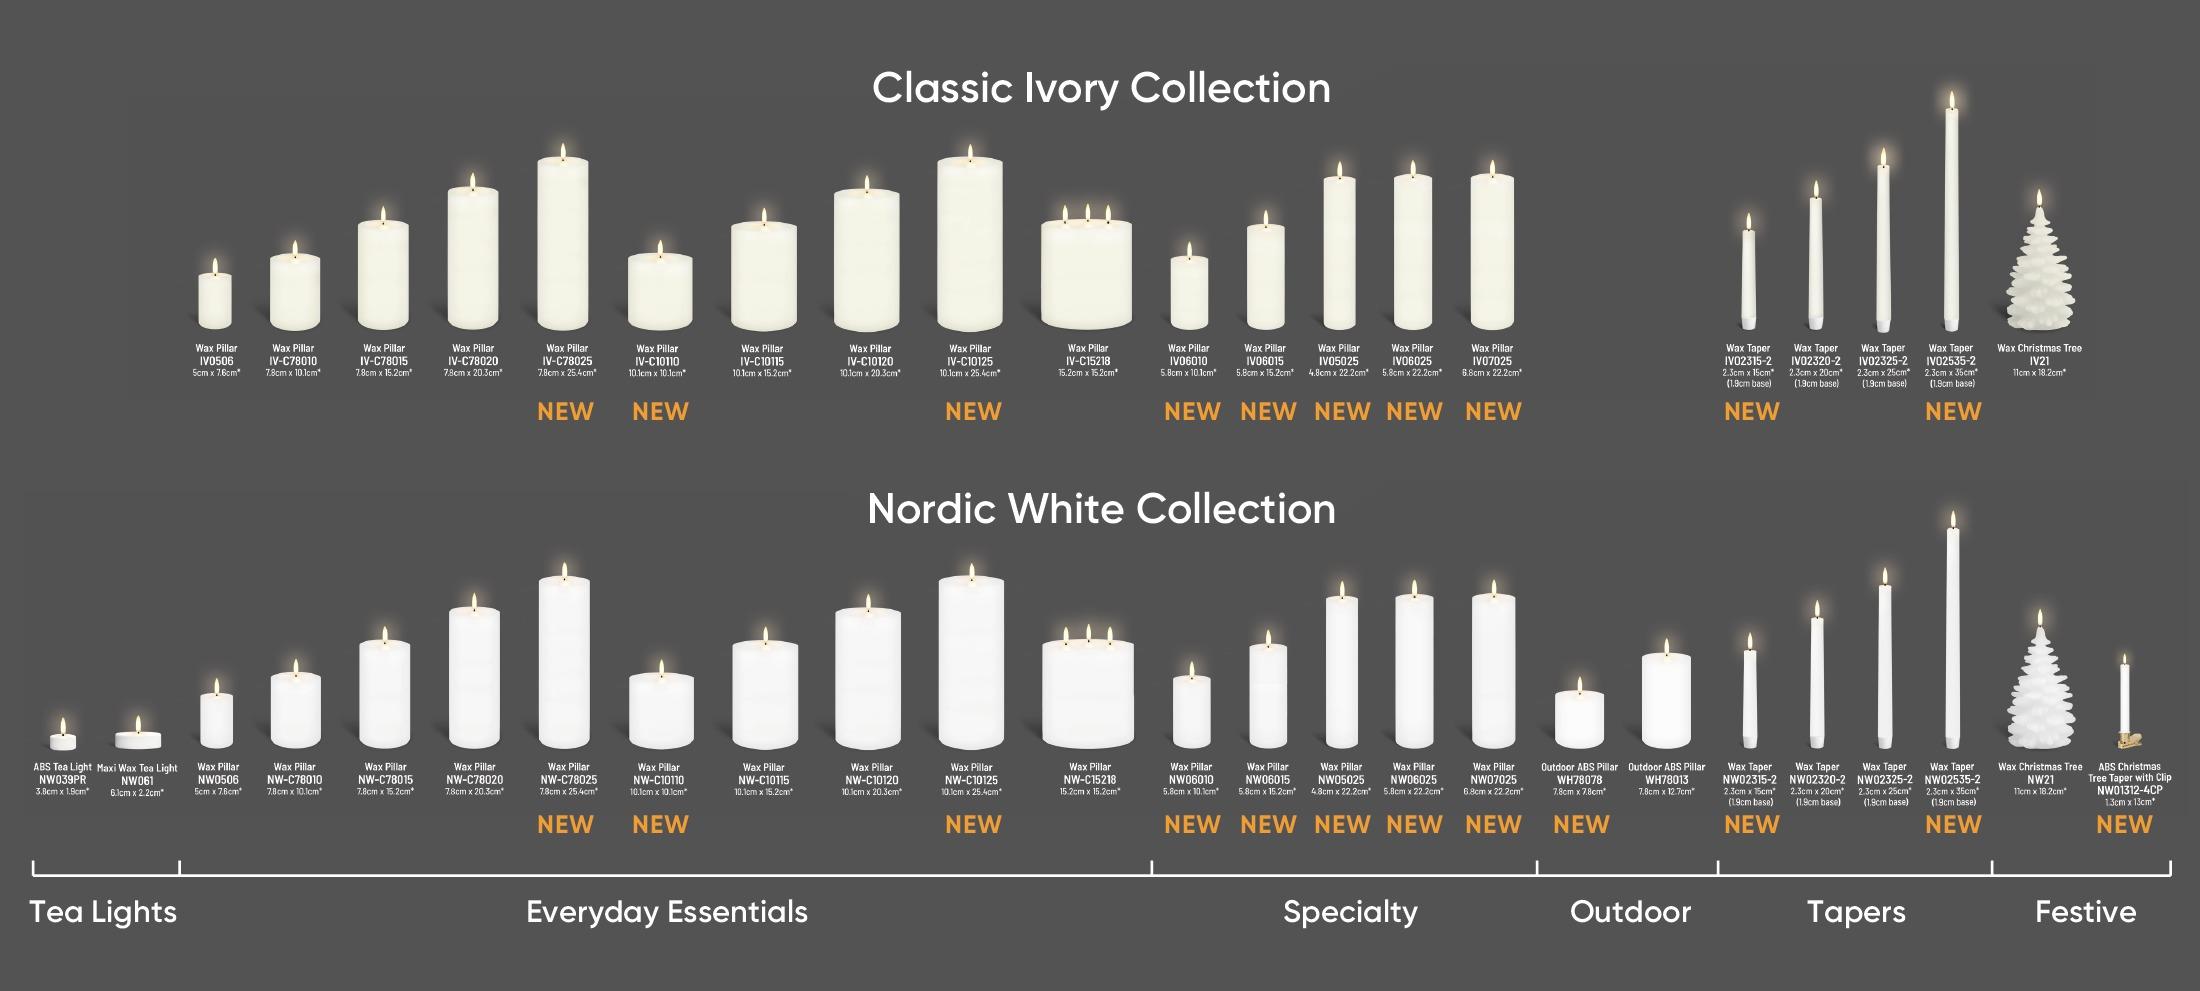 Enjoy Living Uyuni Flameless Candles Comparison